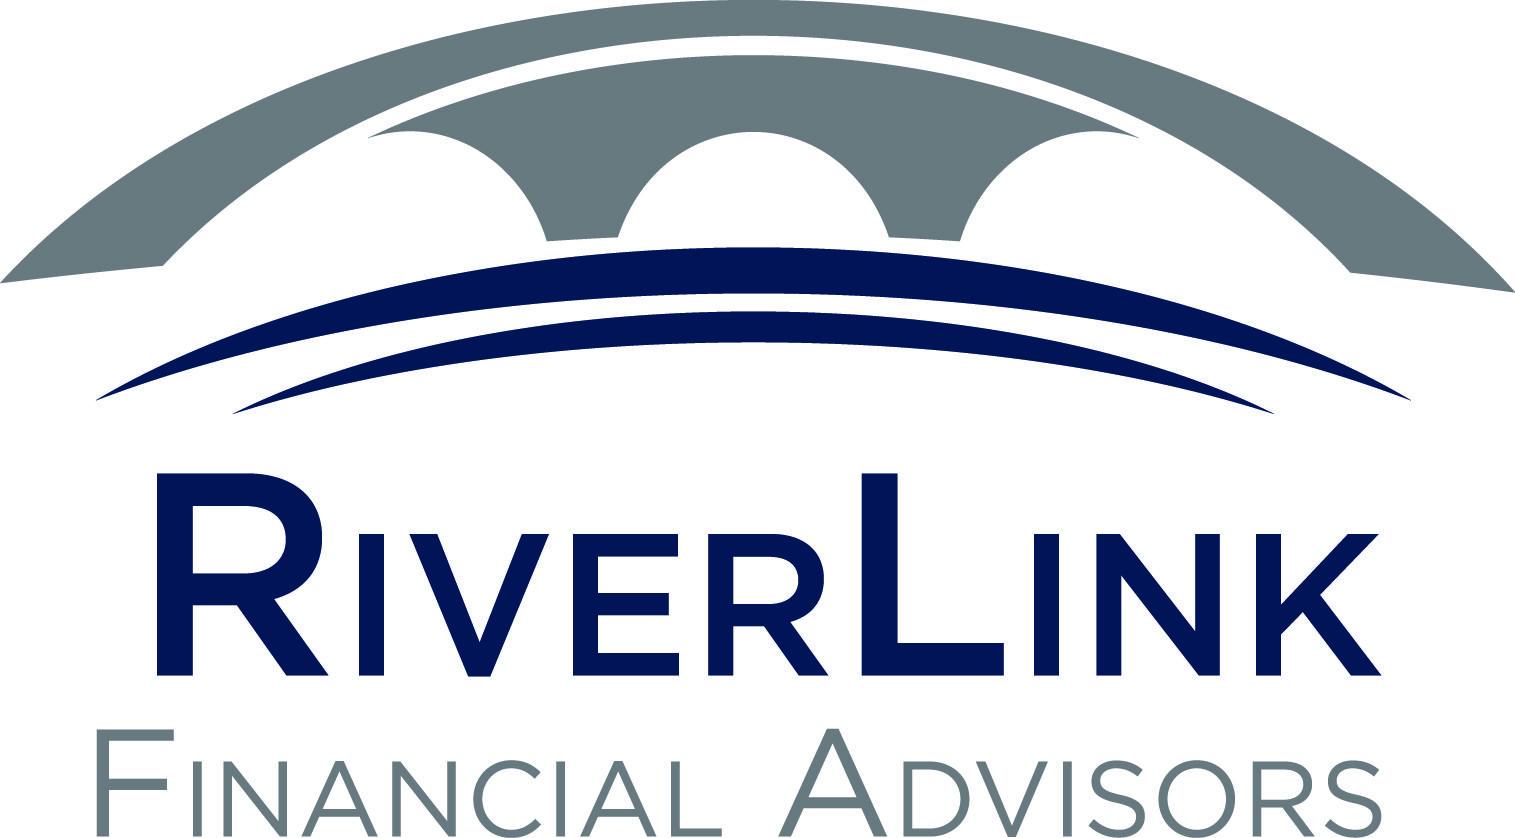 RiverLink Financial Adviosrs